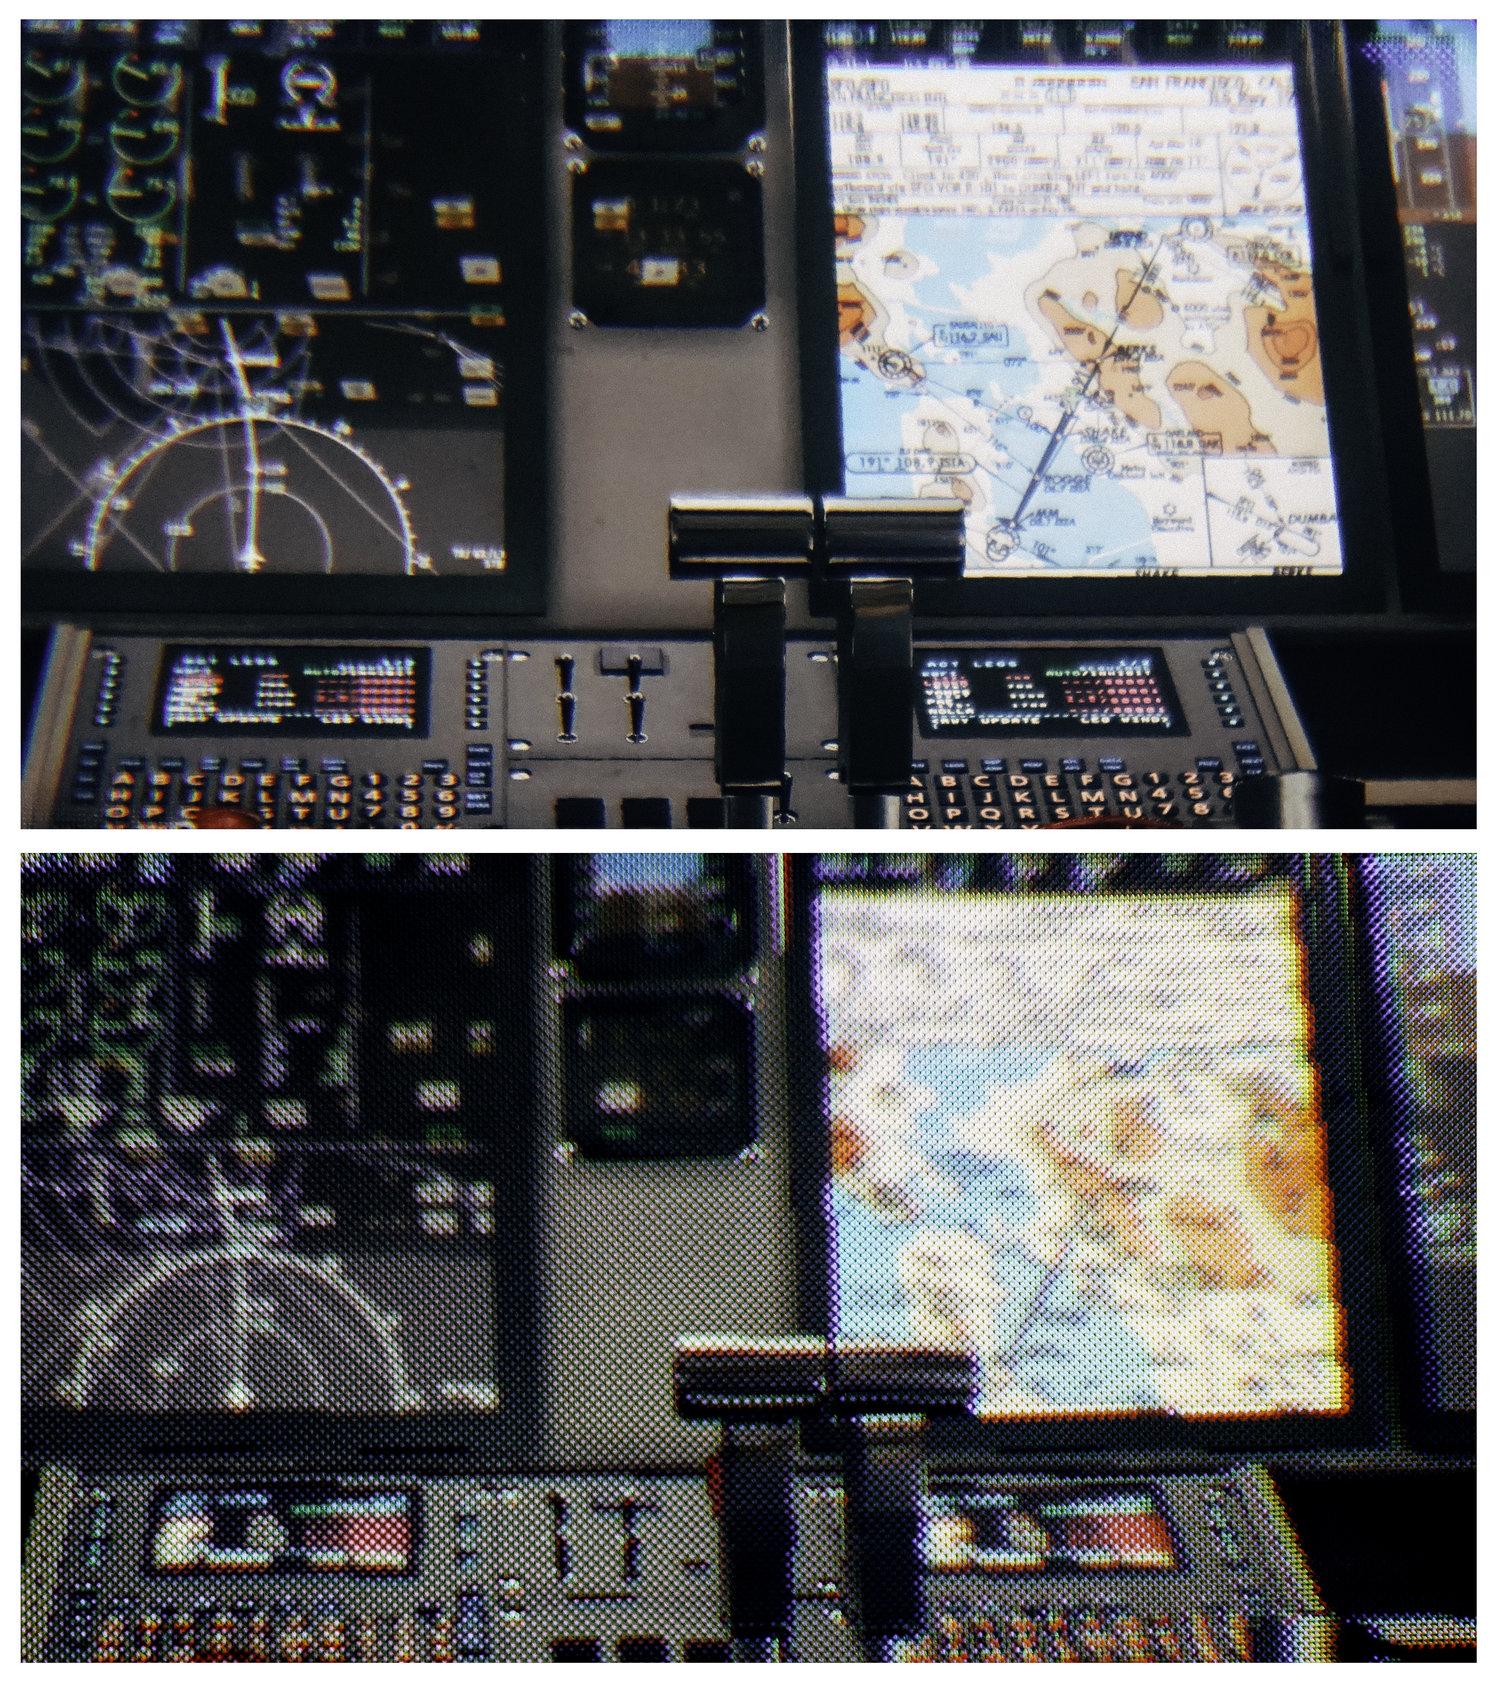 Cockpit+scene